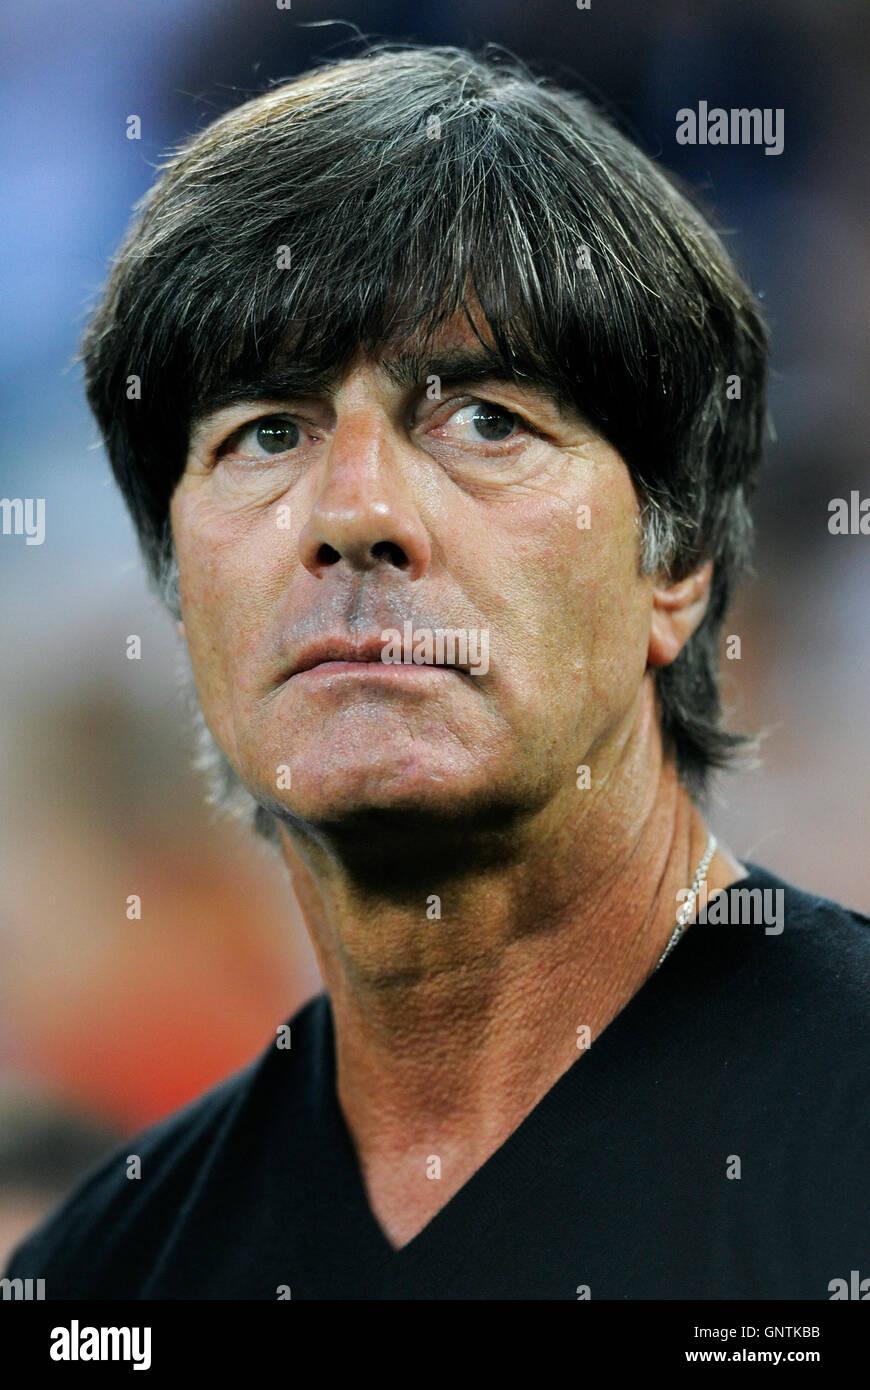 Friendlymatch at  Borussia Park Moenchengladbach, Germany vs Finland; German Nationalcoach Joachim Jogi Loew . - Stock Image